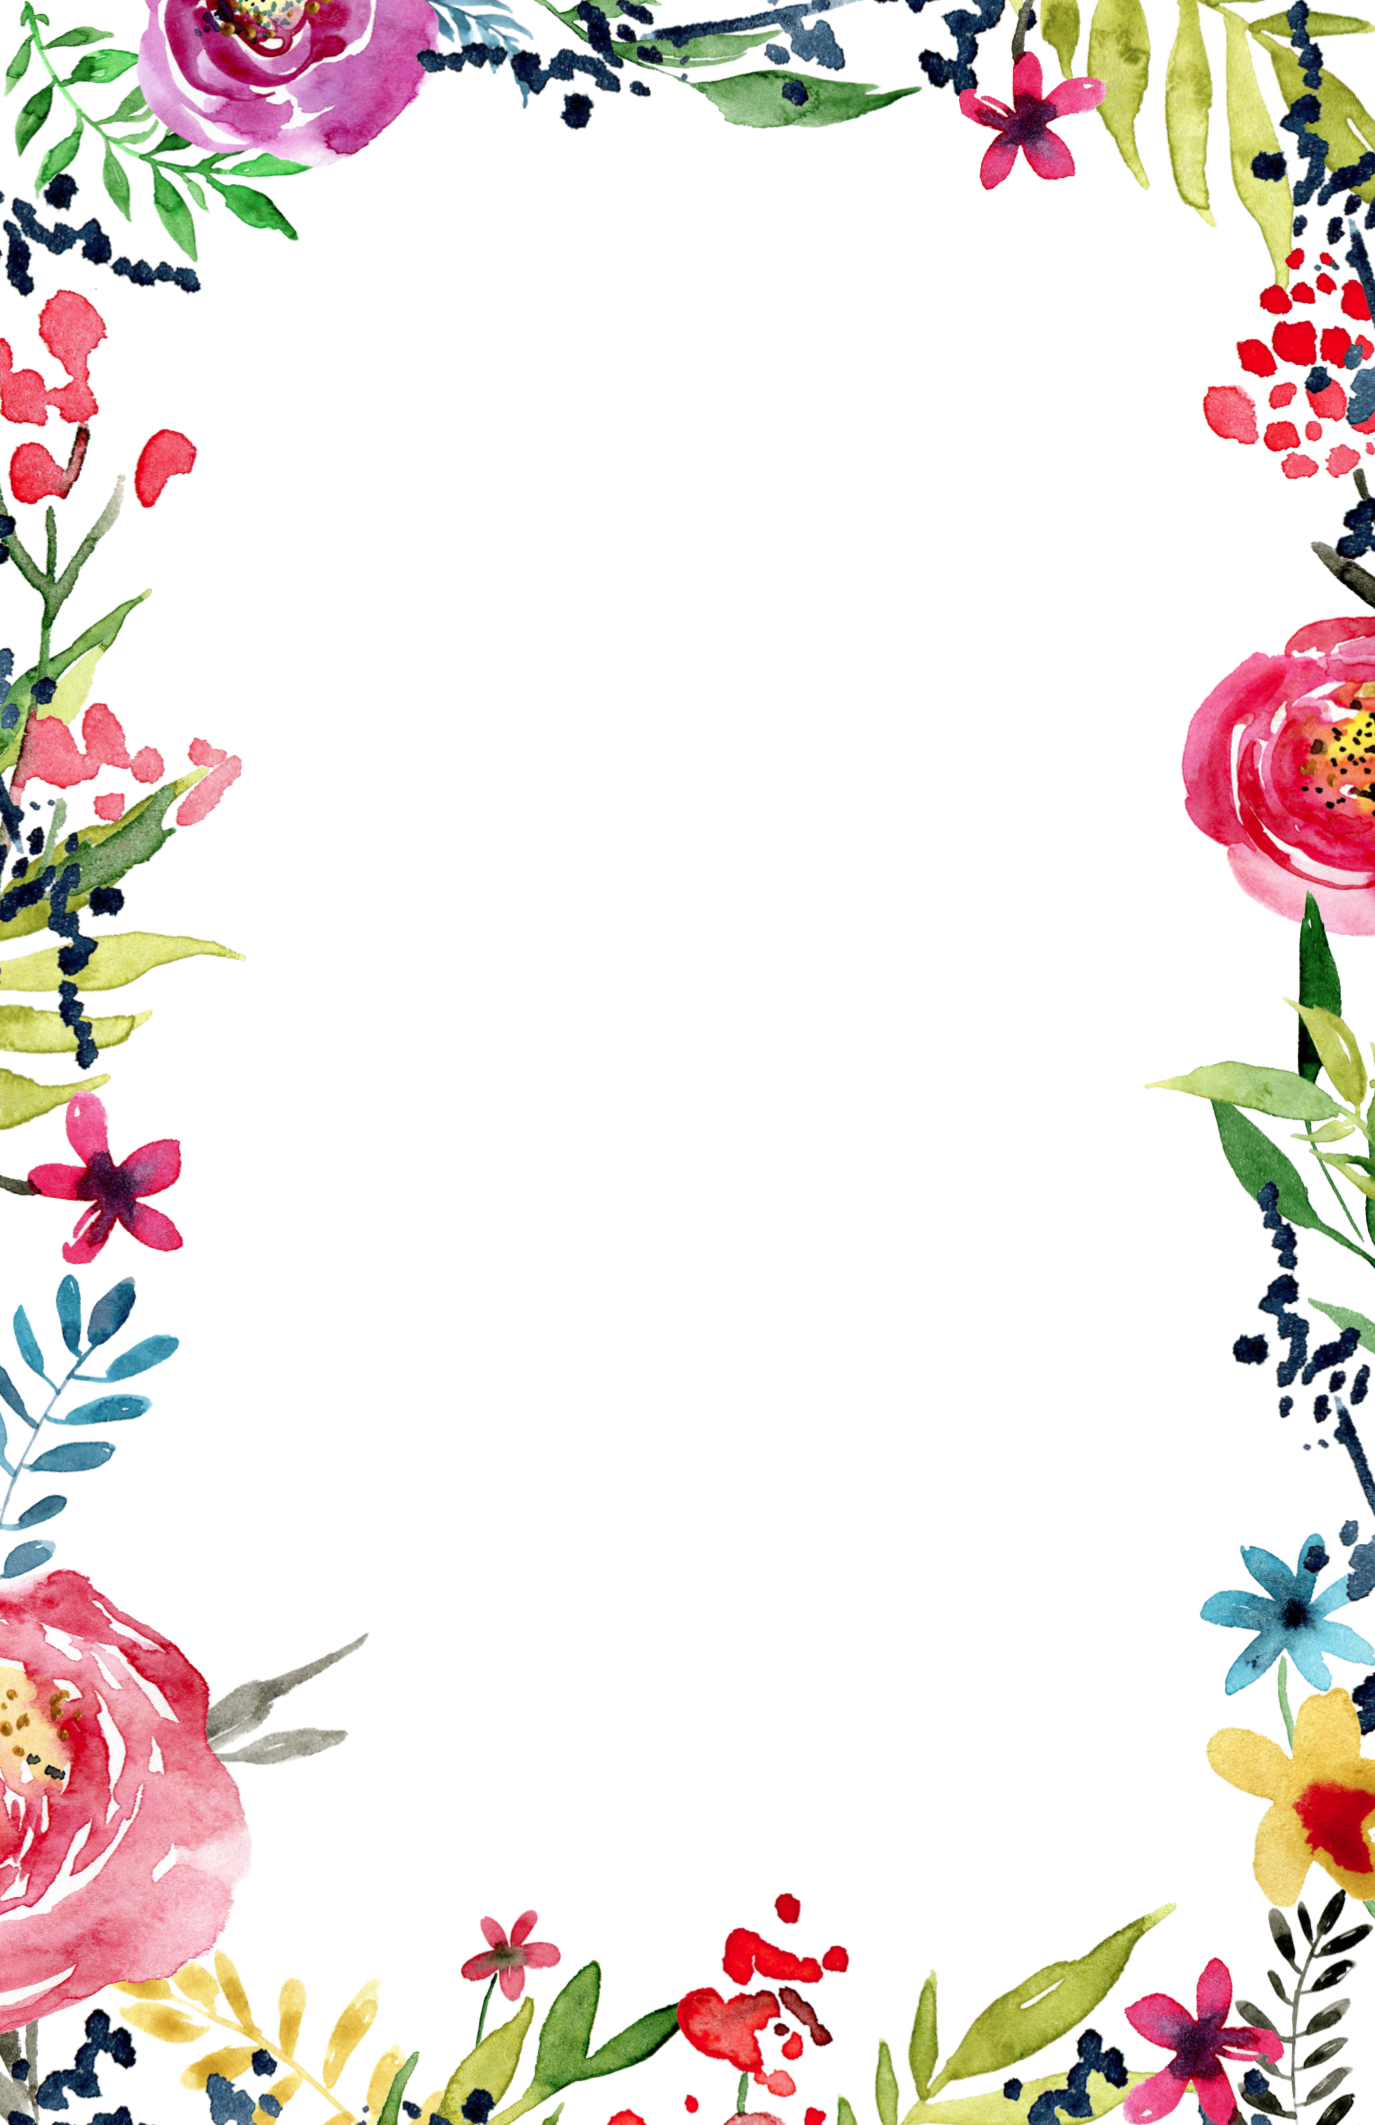 Download Free Transparent Png Image Floral Borders